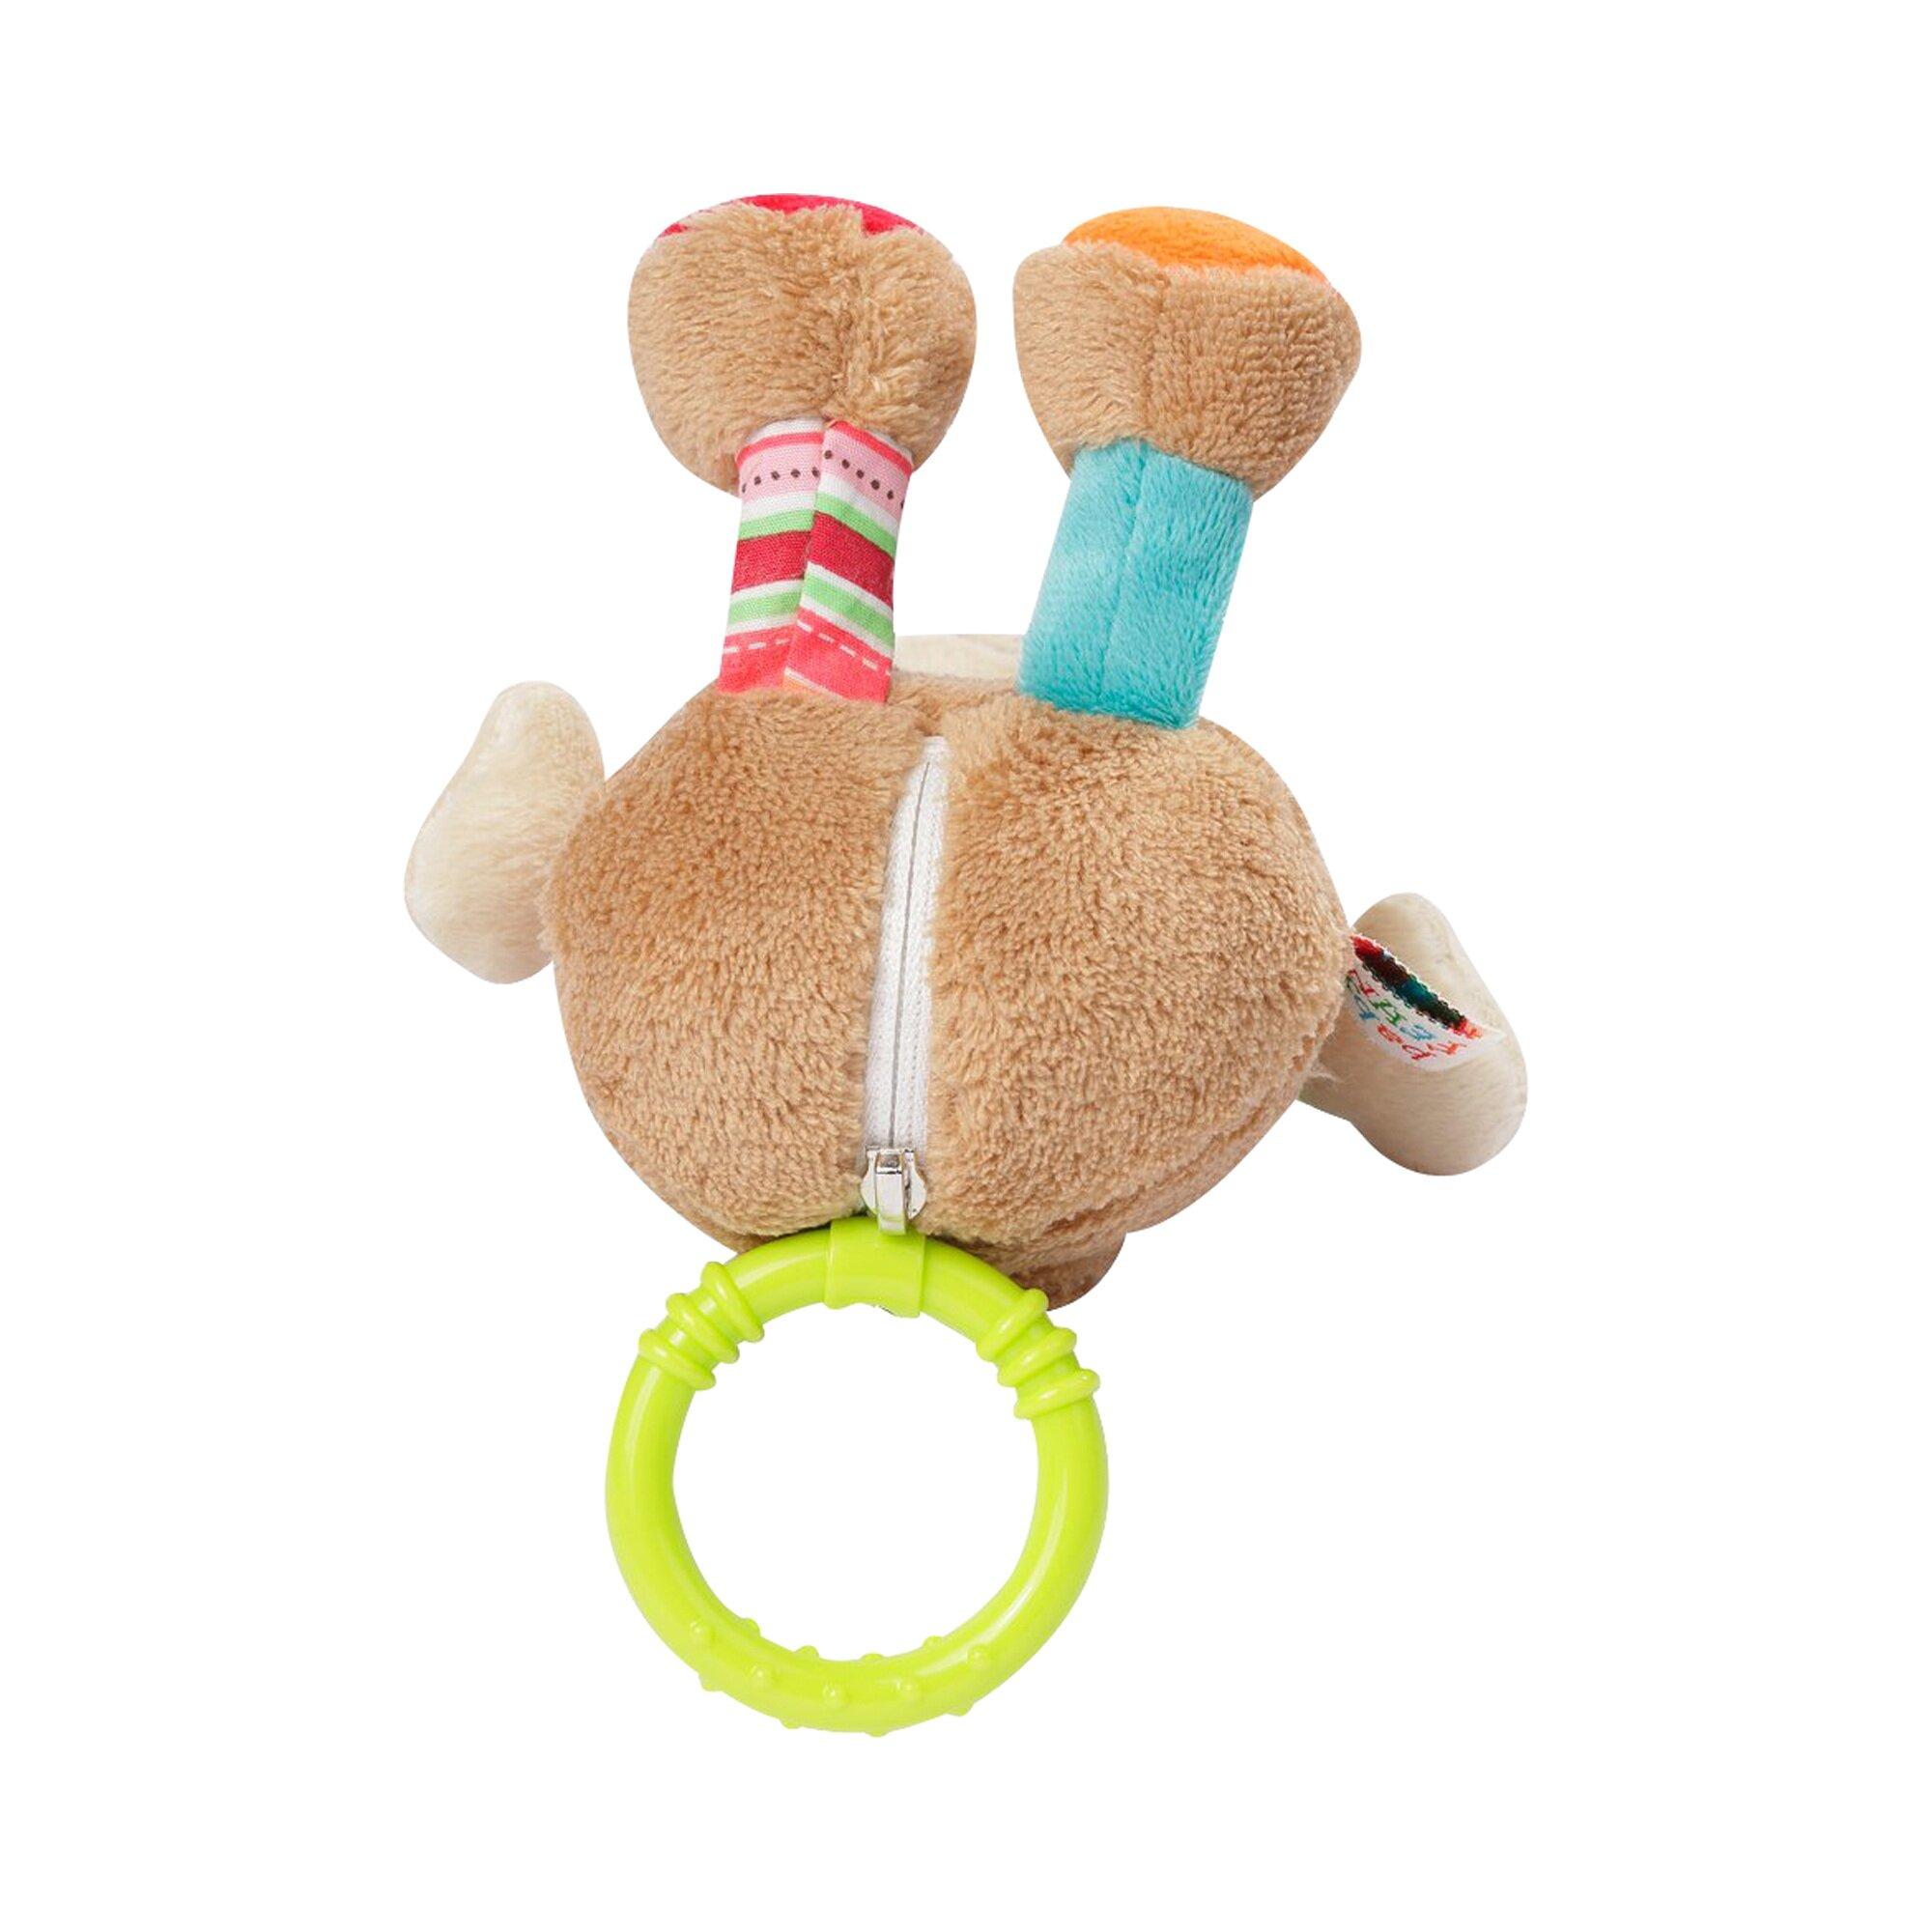 fehn-spieluhr-teddy-oskar-18cm